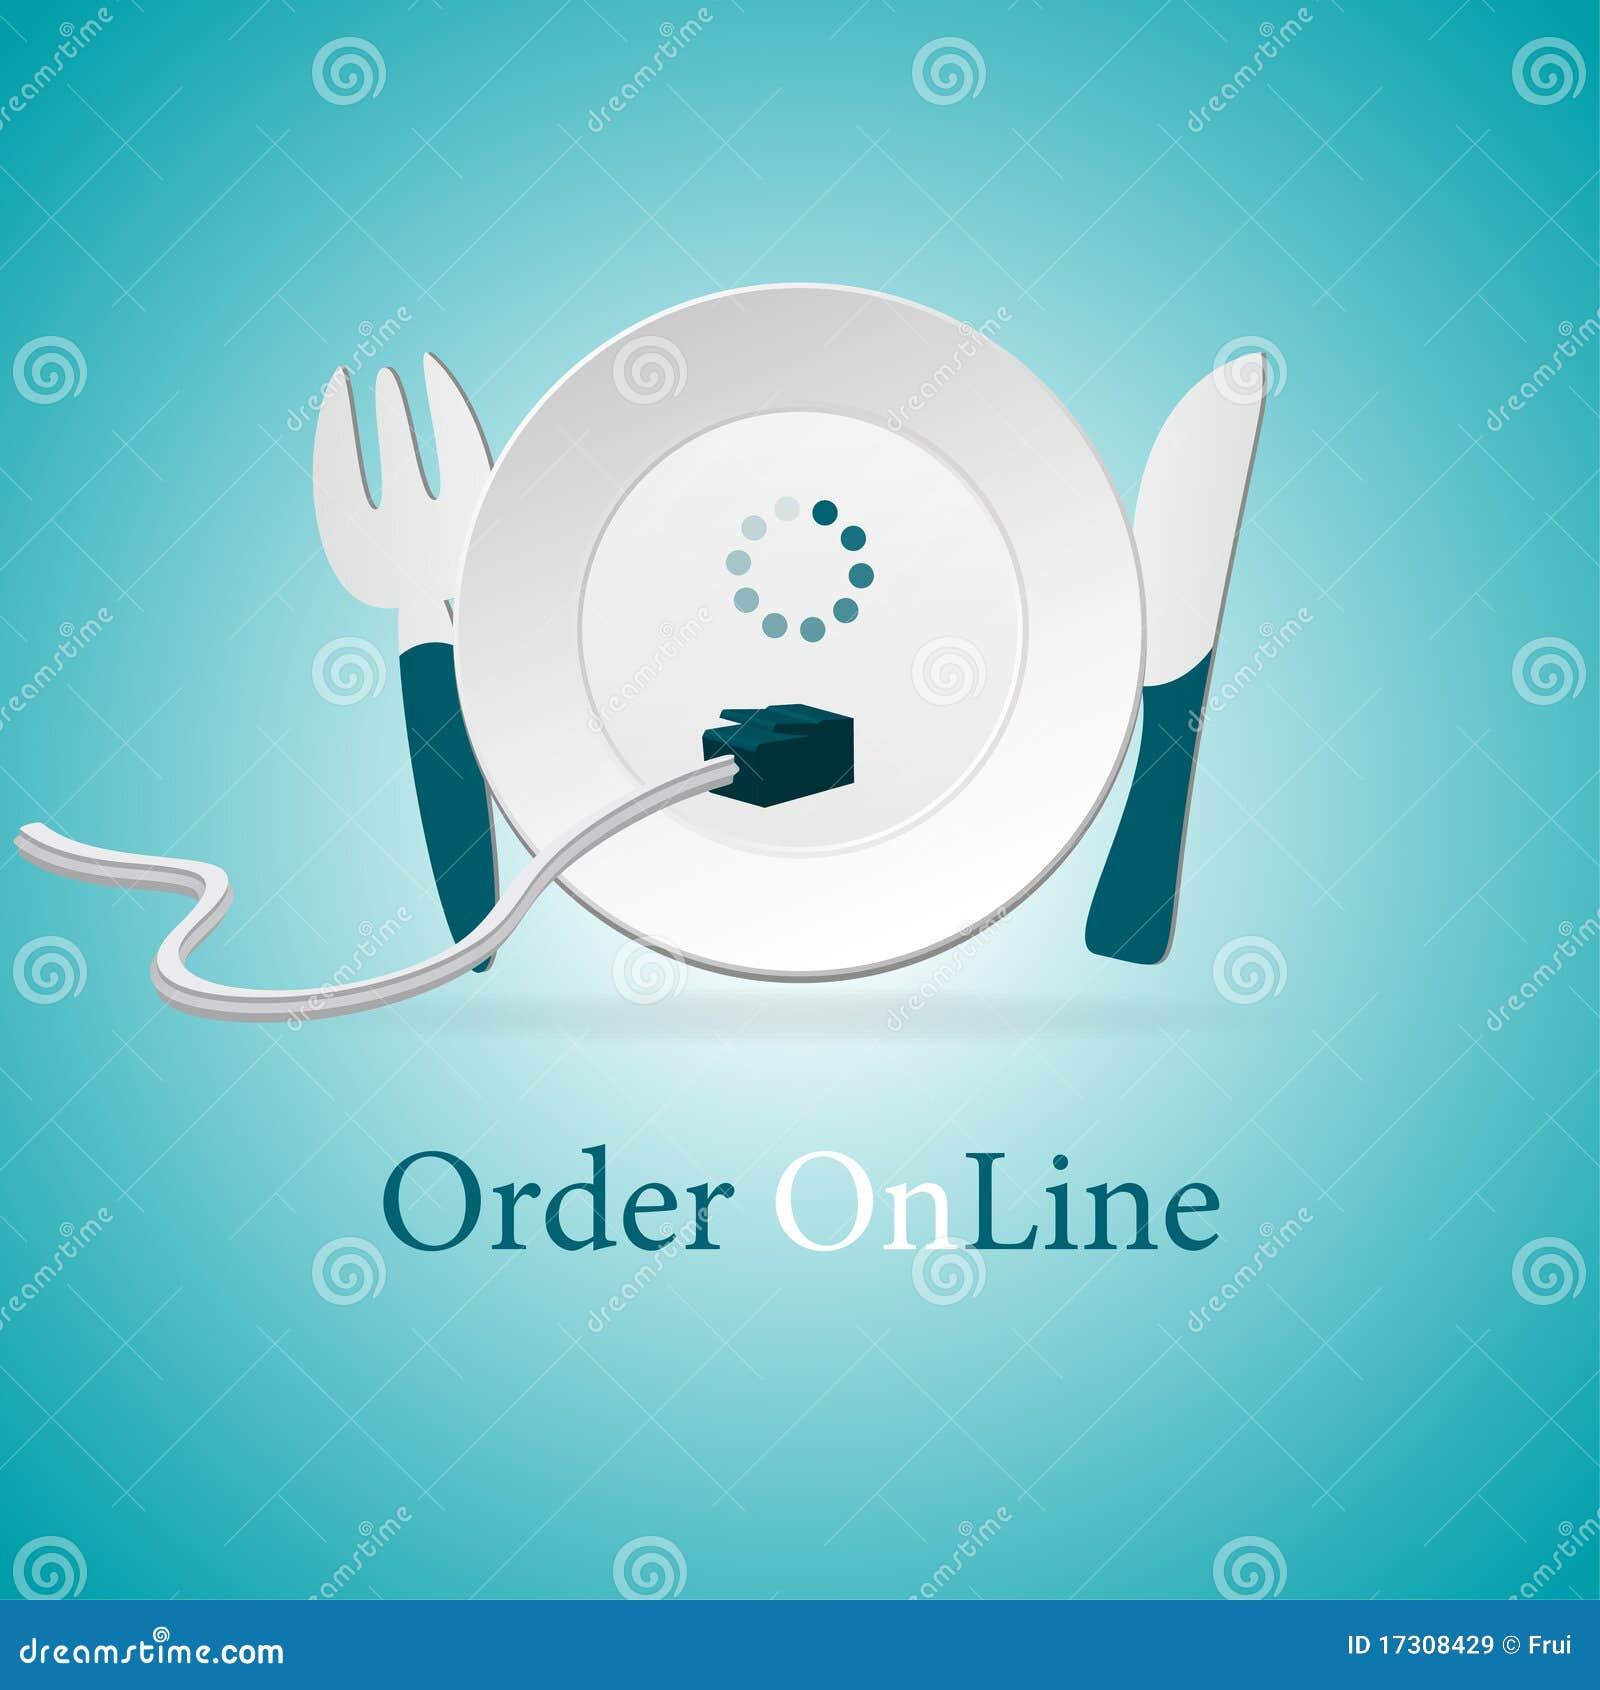 Ordnungs-Nahrungsmittelanlieferung online